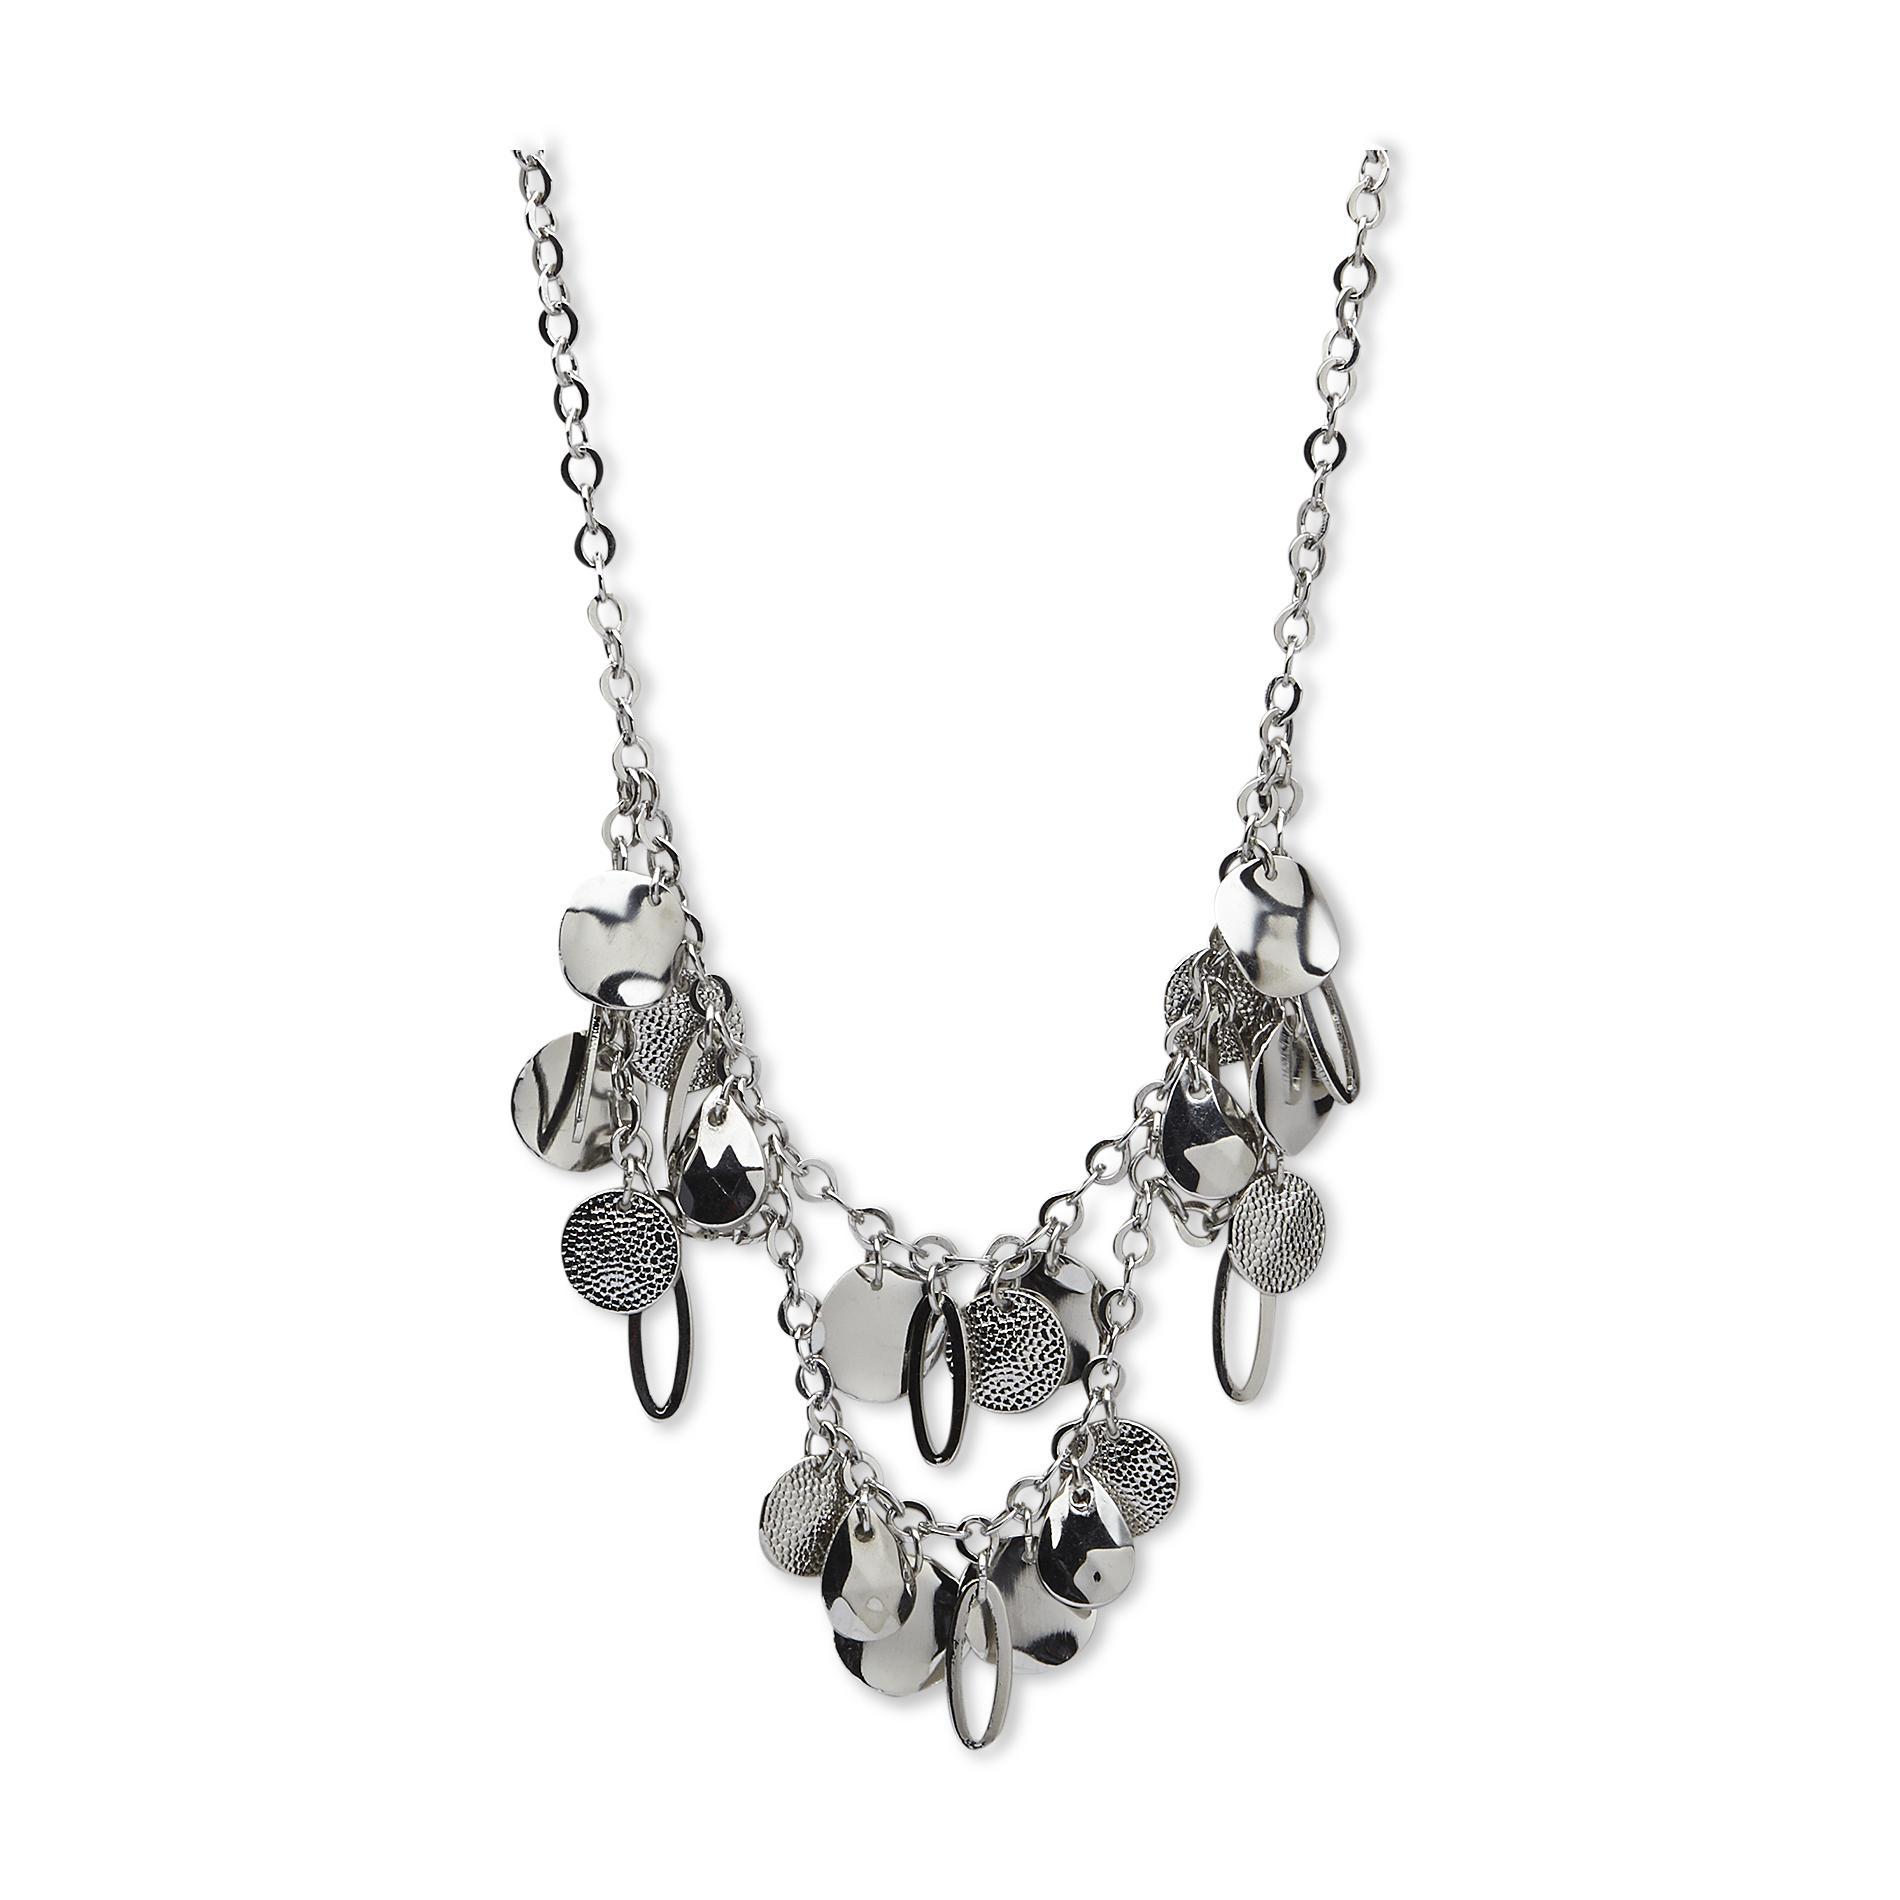 Jaclyn Smith Women's Silvertone Cluster Necklace